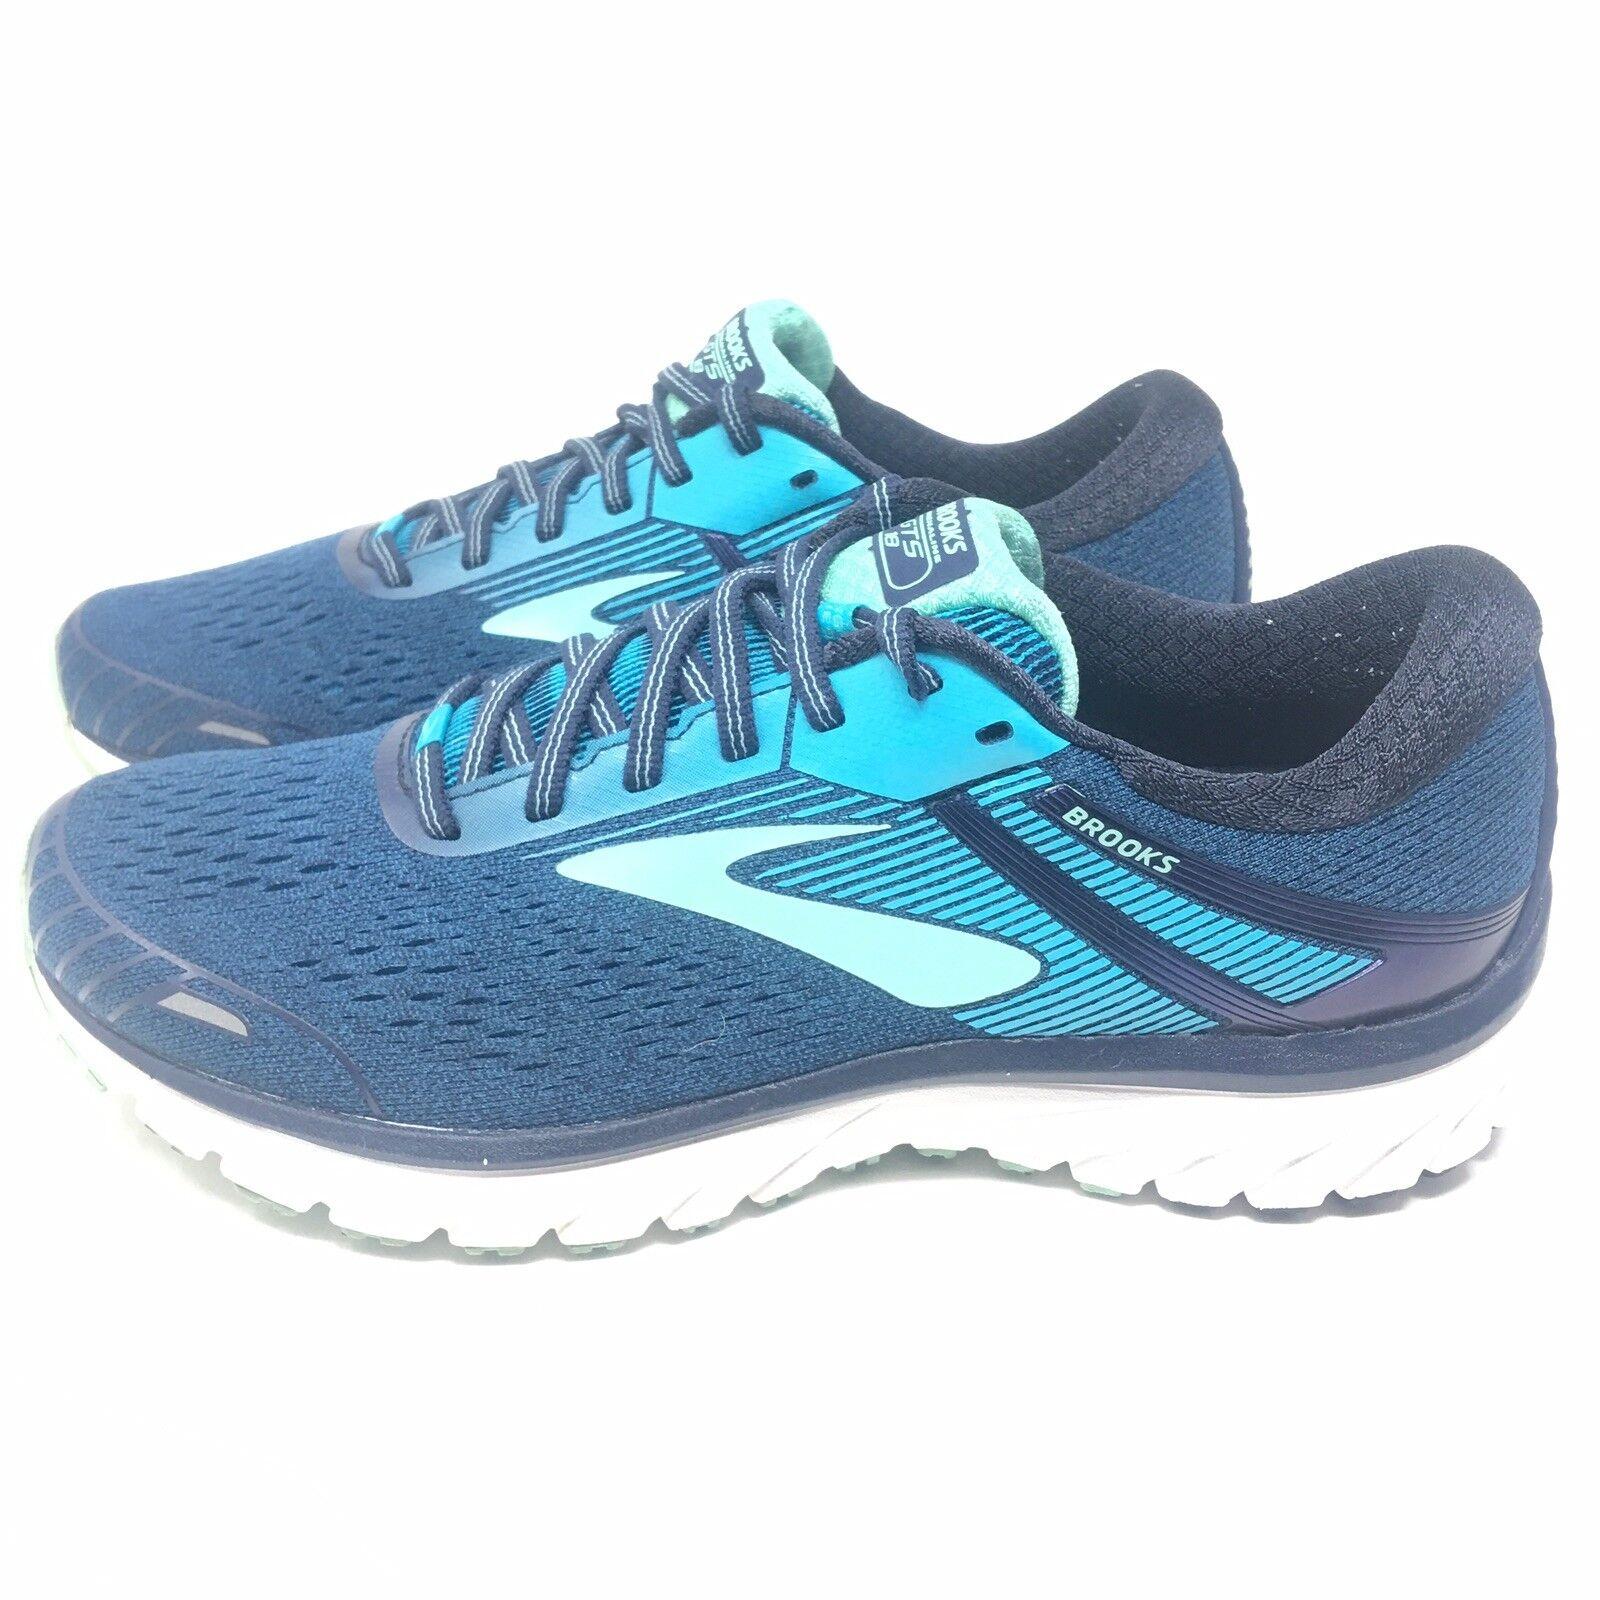 Brooks Adrenaline GTS 18 Running scarpe scarpe da ginnastica Wouomo Sz 11 M Navy Teal